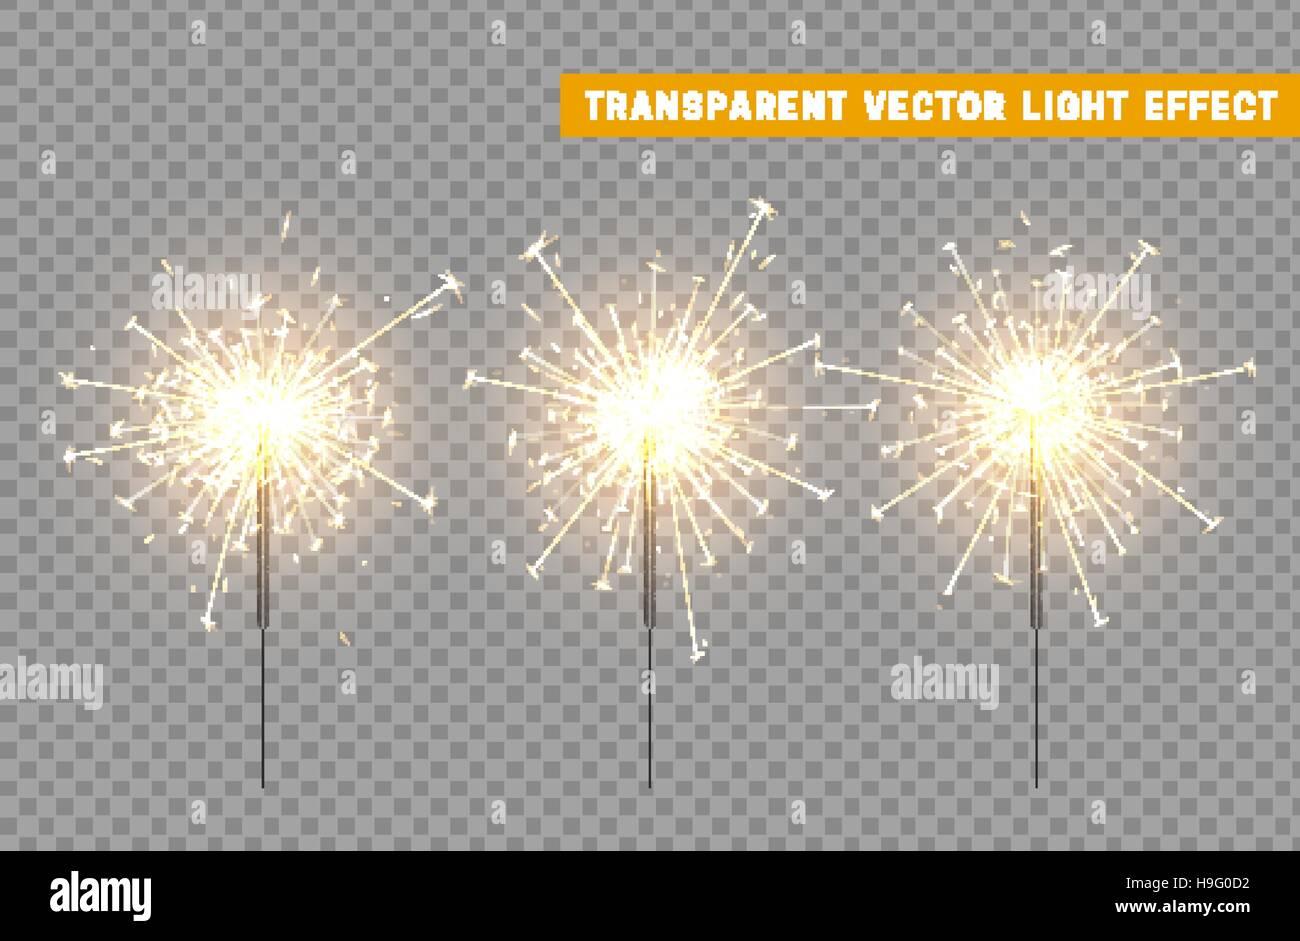 Festive Christmas sparkler decoration lighting element. Sparkler vector firework. Magic light isolated effect. For the background of the holiday and b  sc 1 st  Alamy & Festive Christmas sparkler decoration lighting element. Sparkler ... azcodes.com